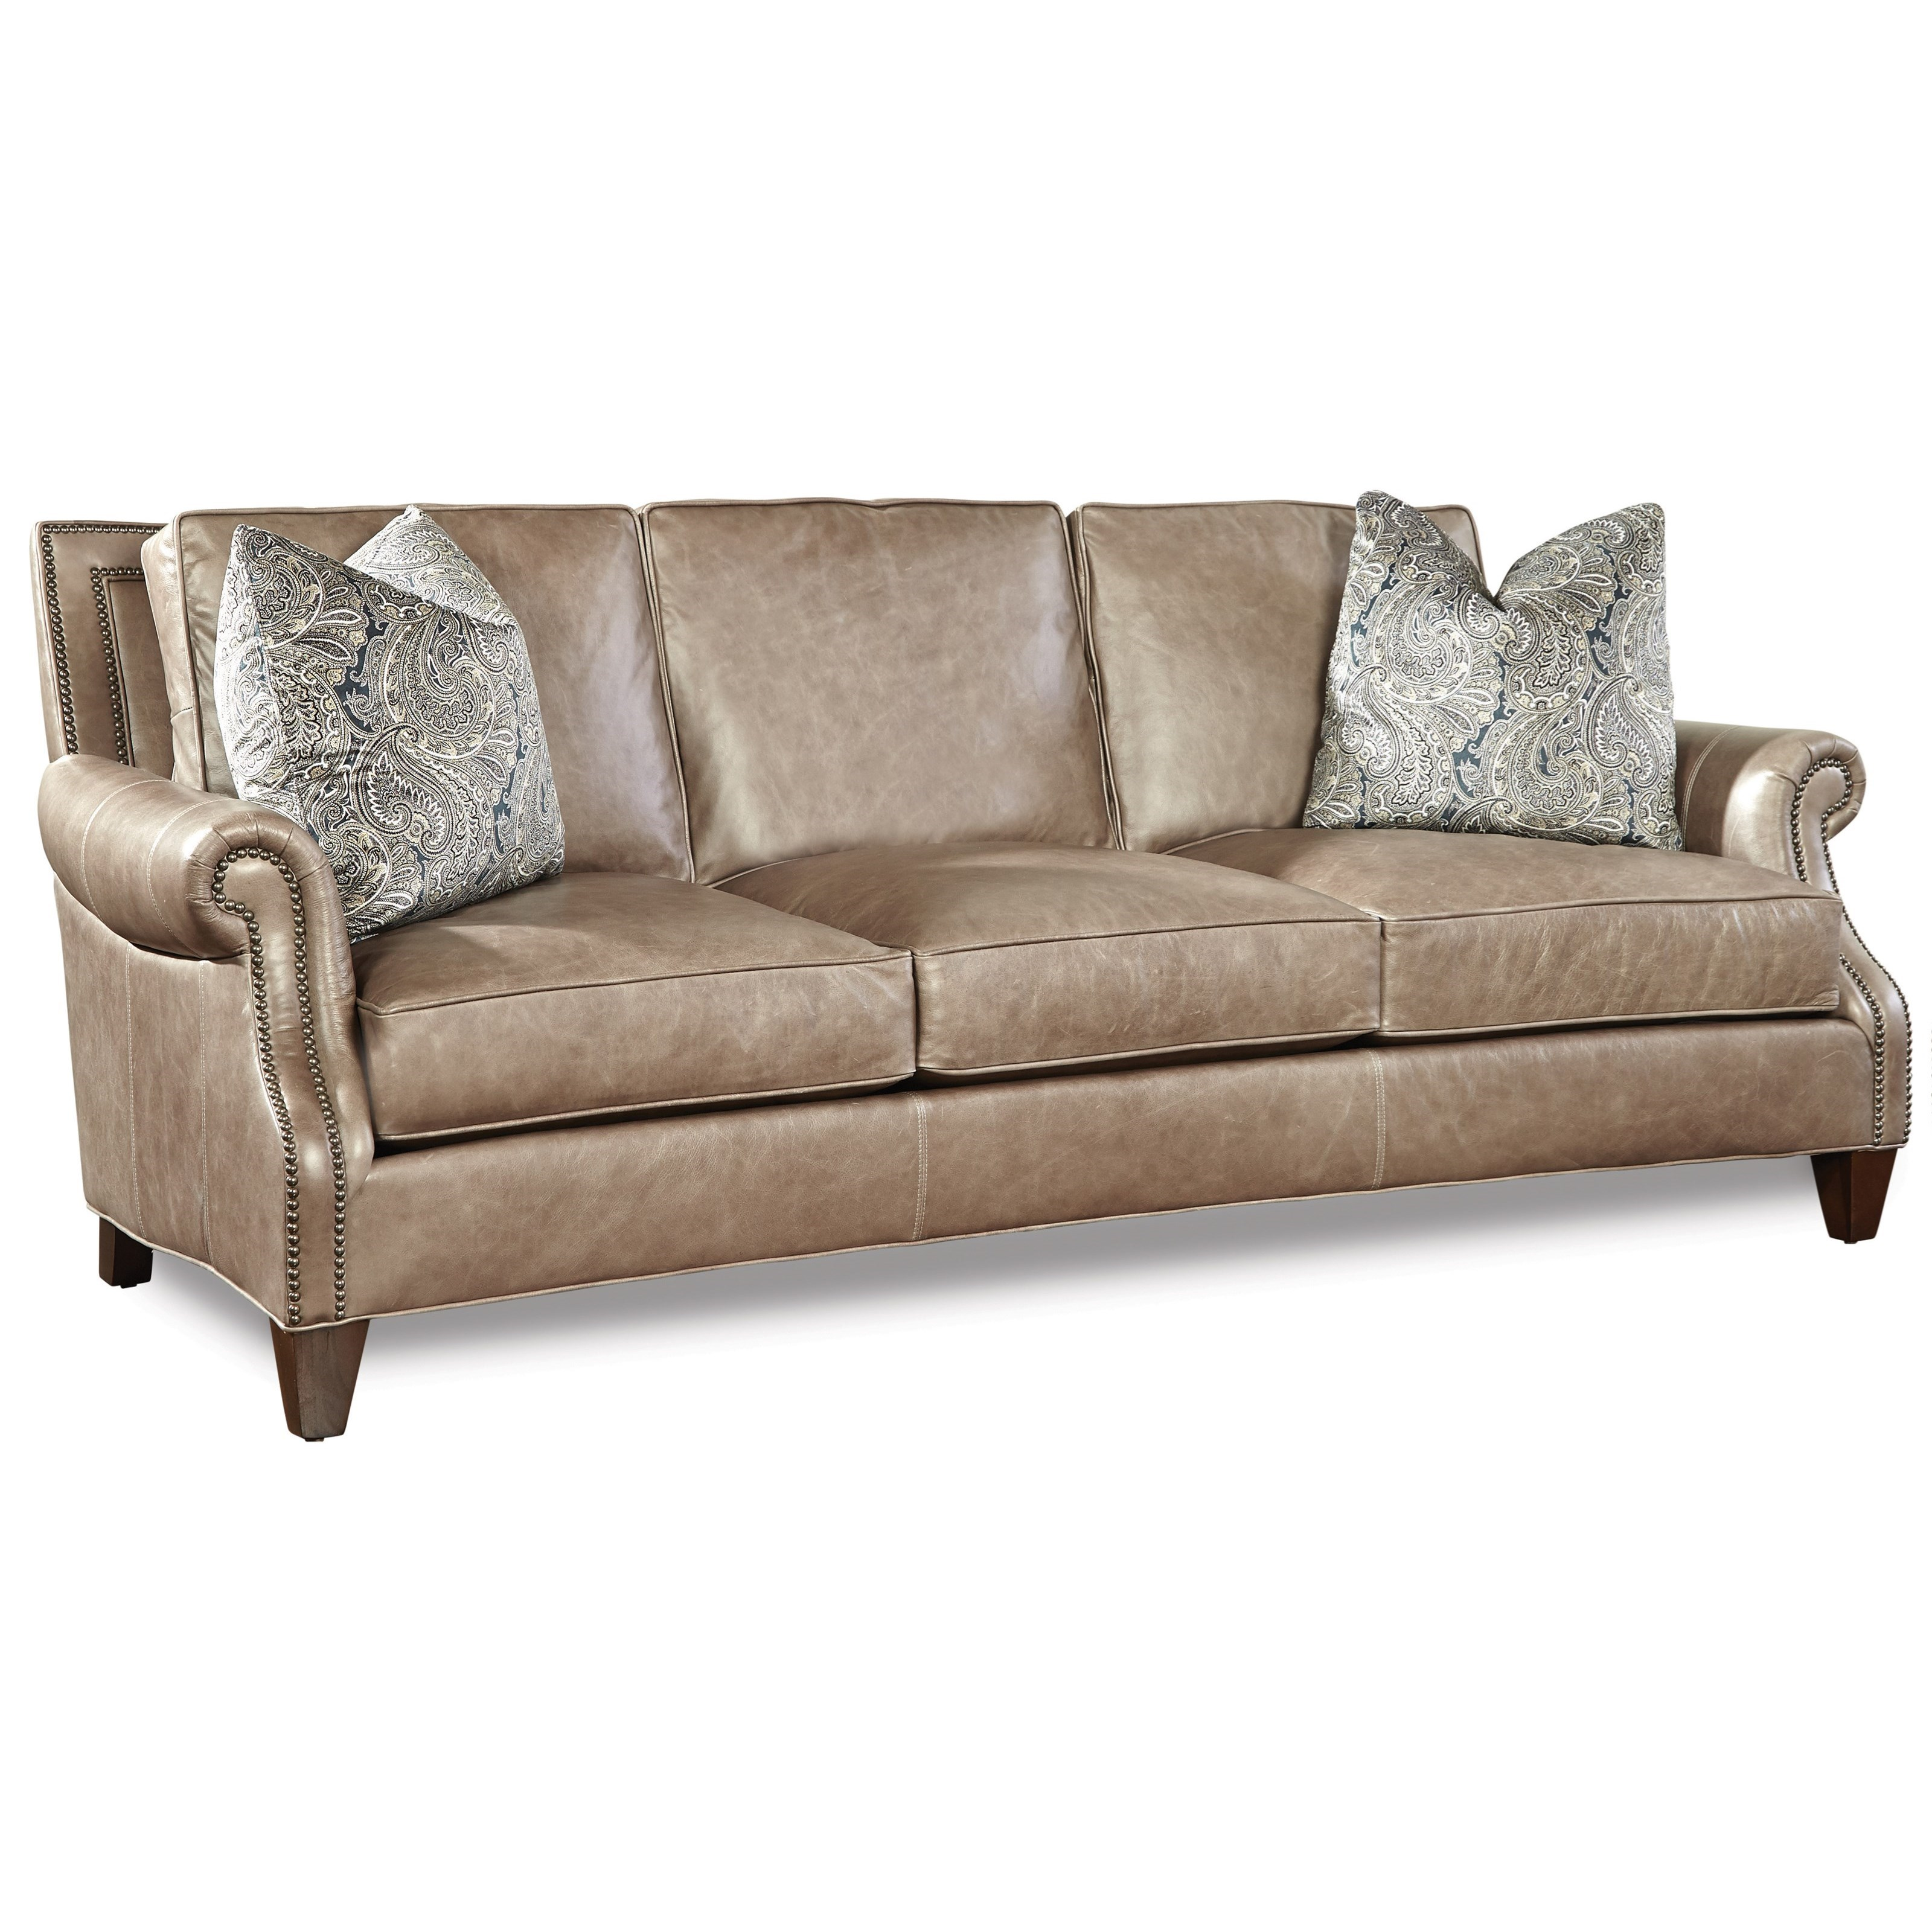 Johnson Sofa by Huntington House at Belfort Furniture